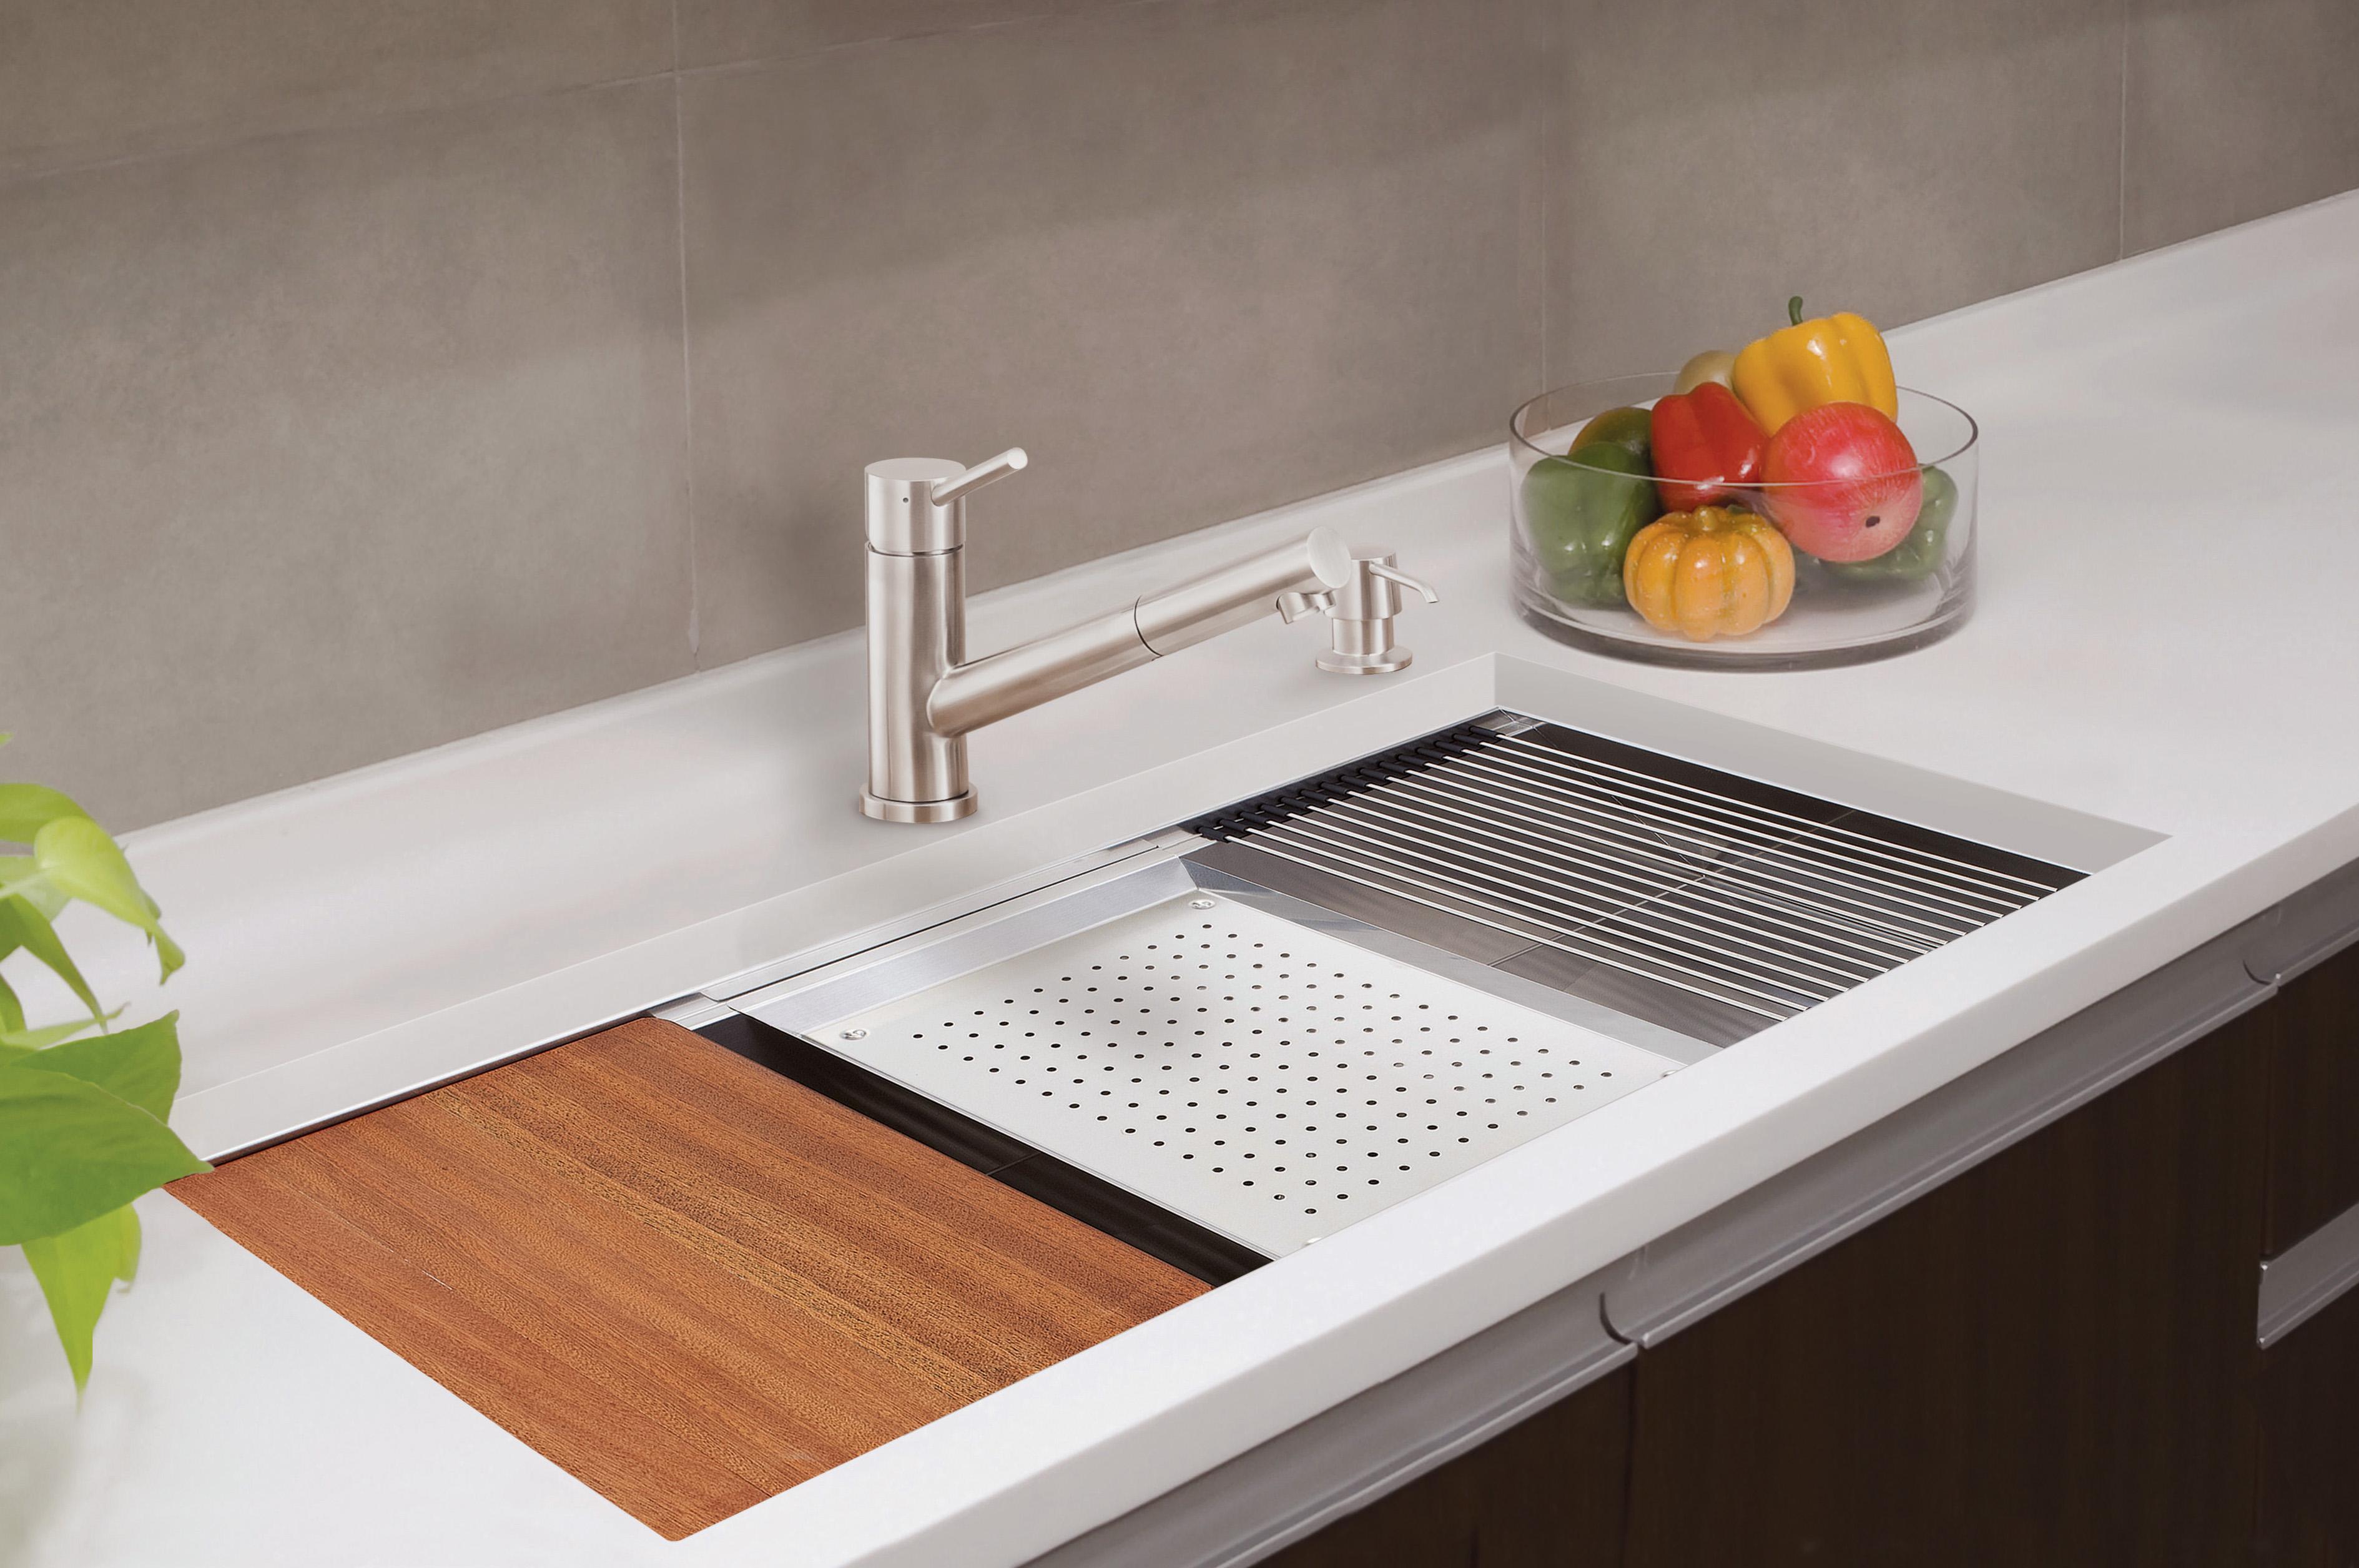 kitchen island with prep sink kohler sinks home depot lenova ledge brings sleek style functionality